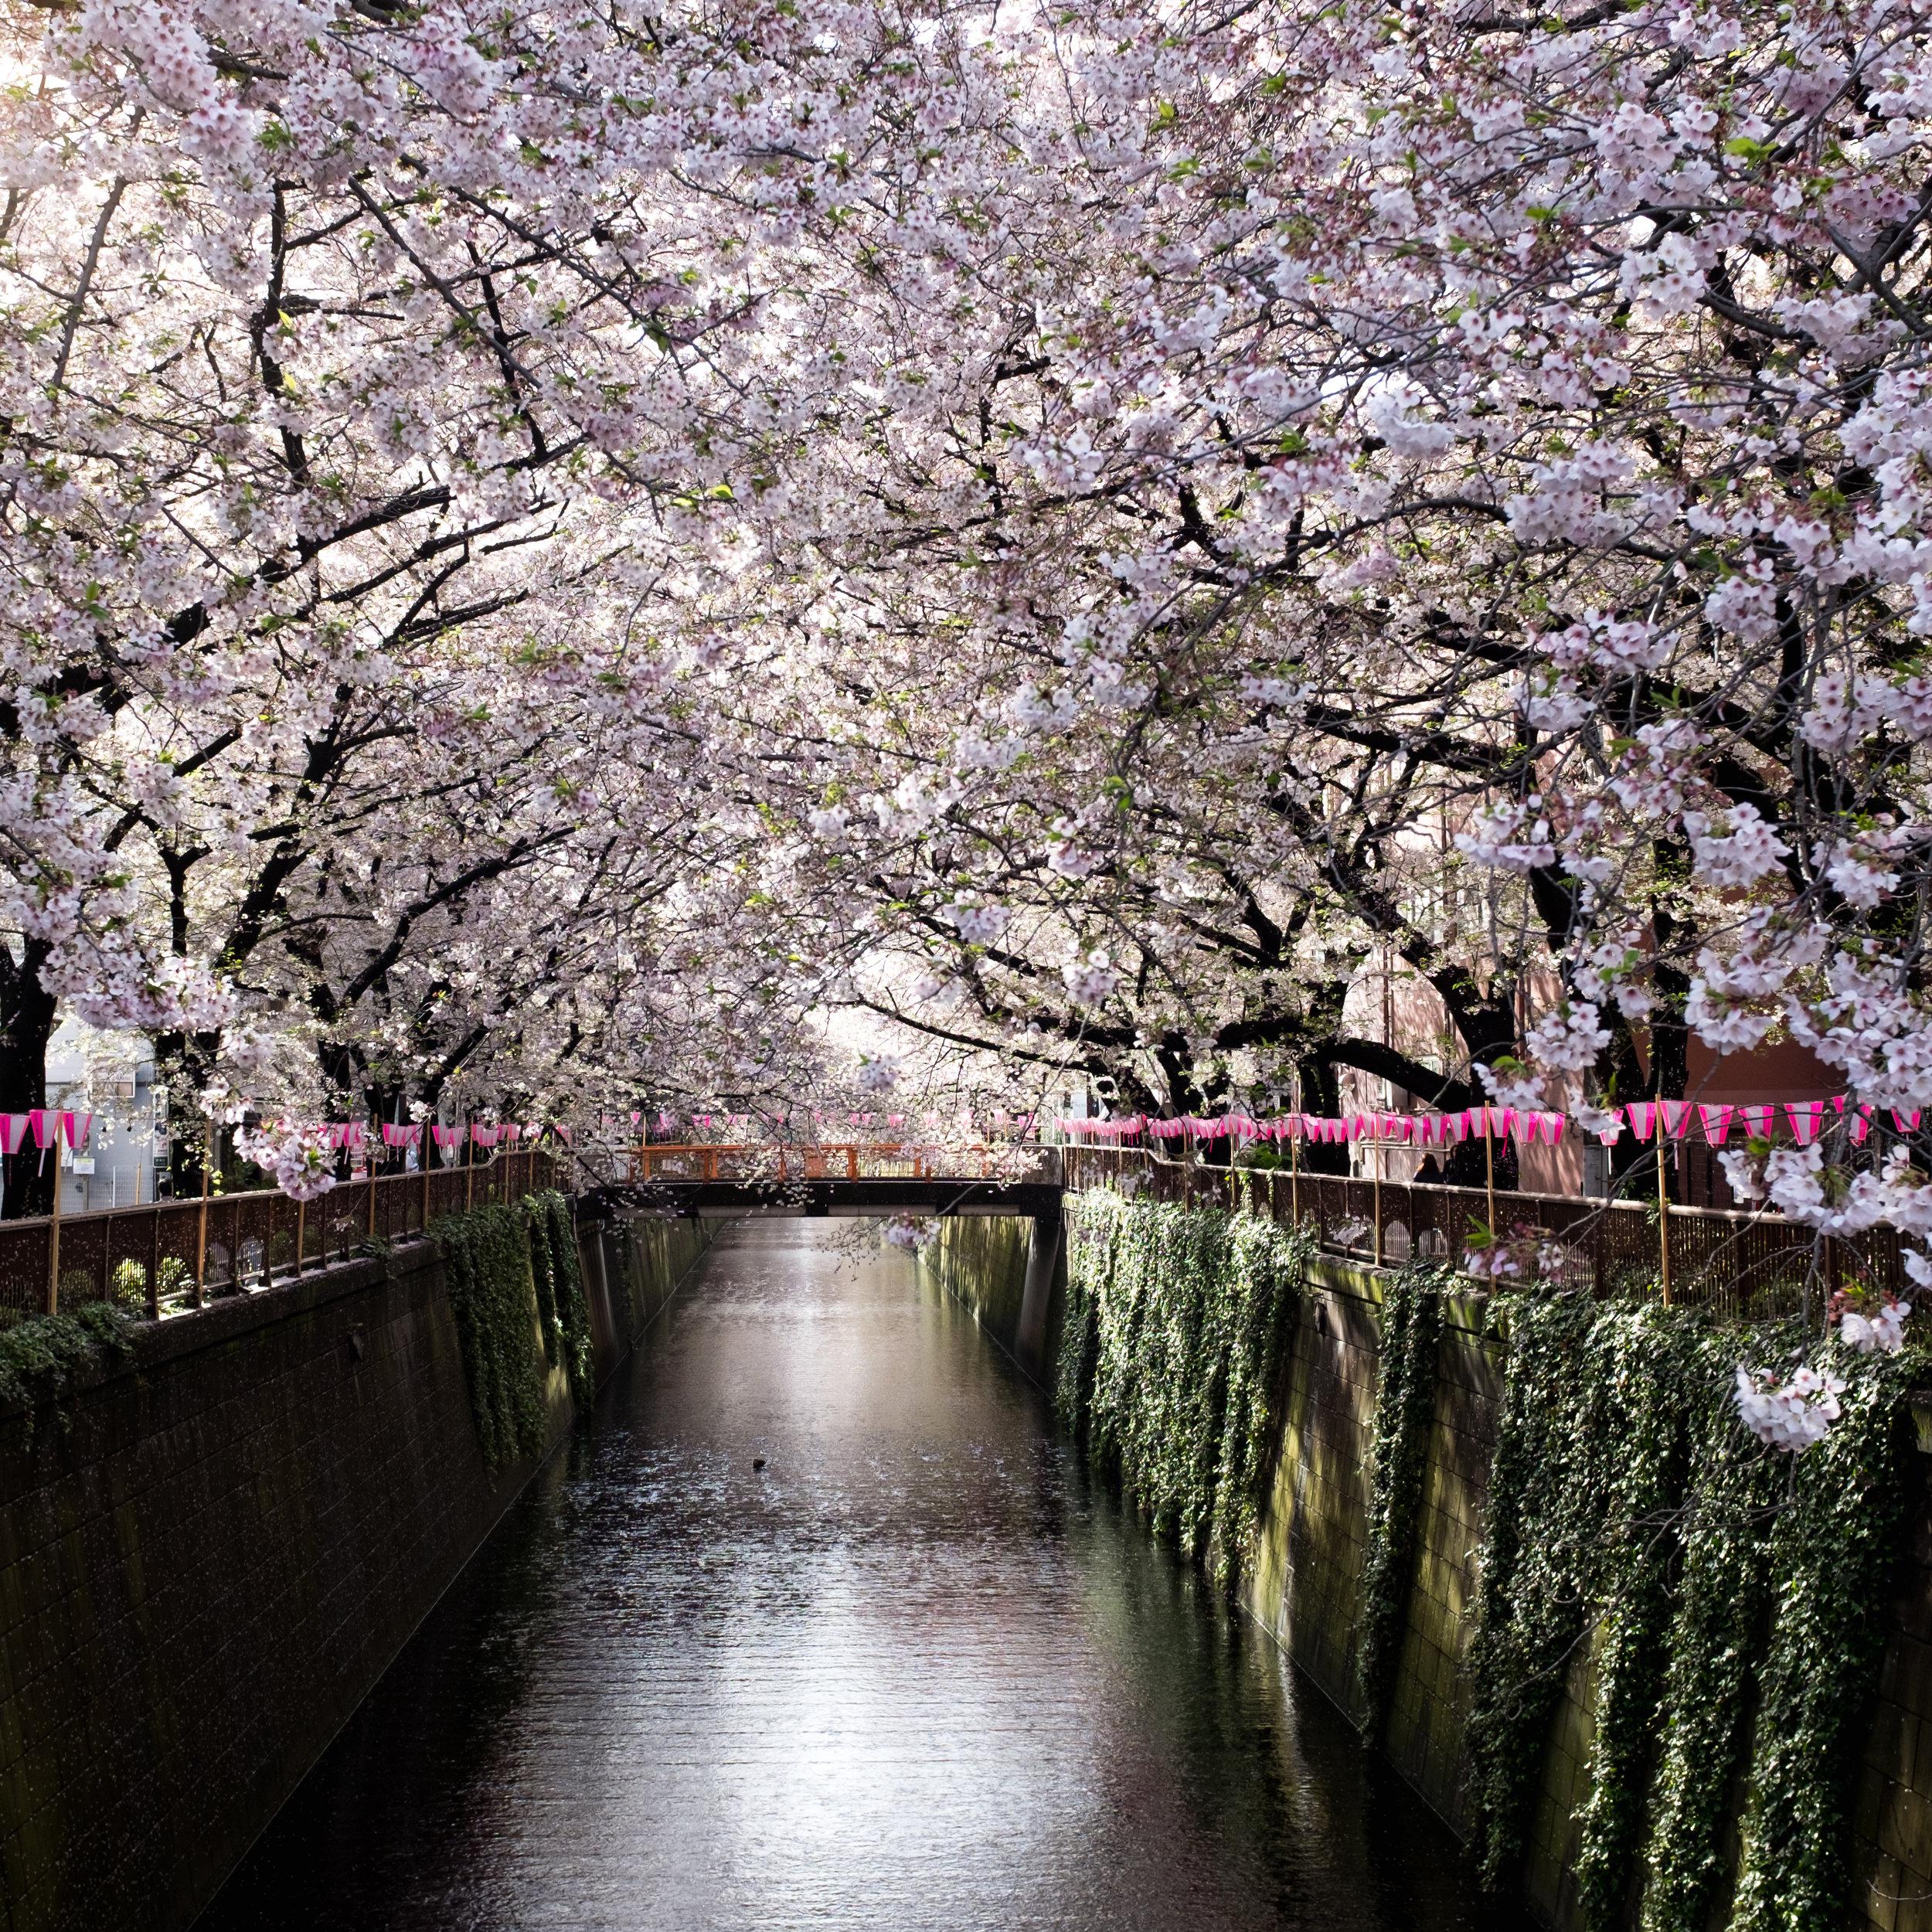 canal running through Naka Meguro